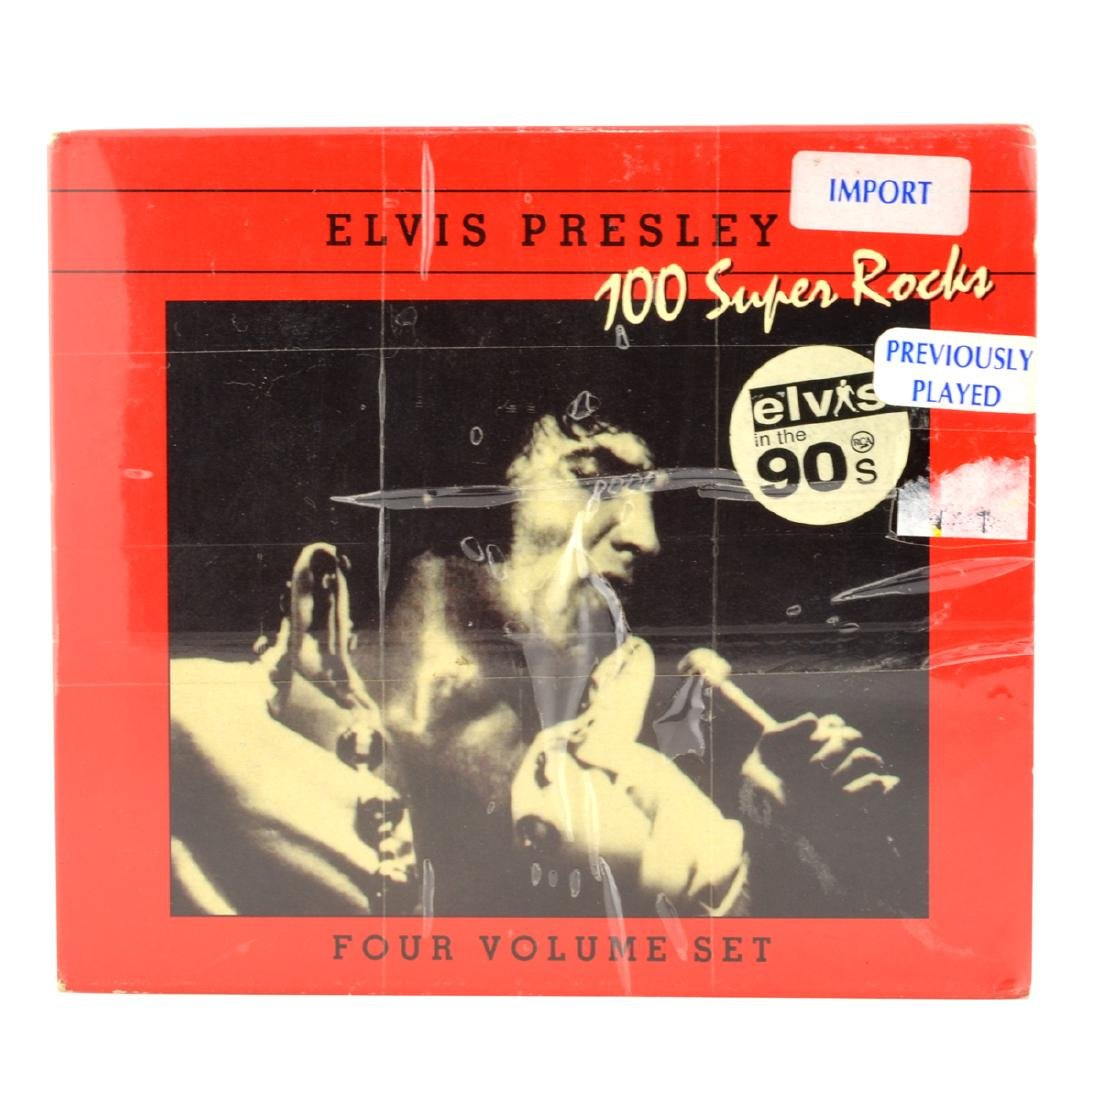 Elvis Presley 4 CD's 100 Super Rocks